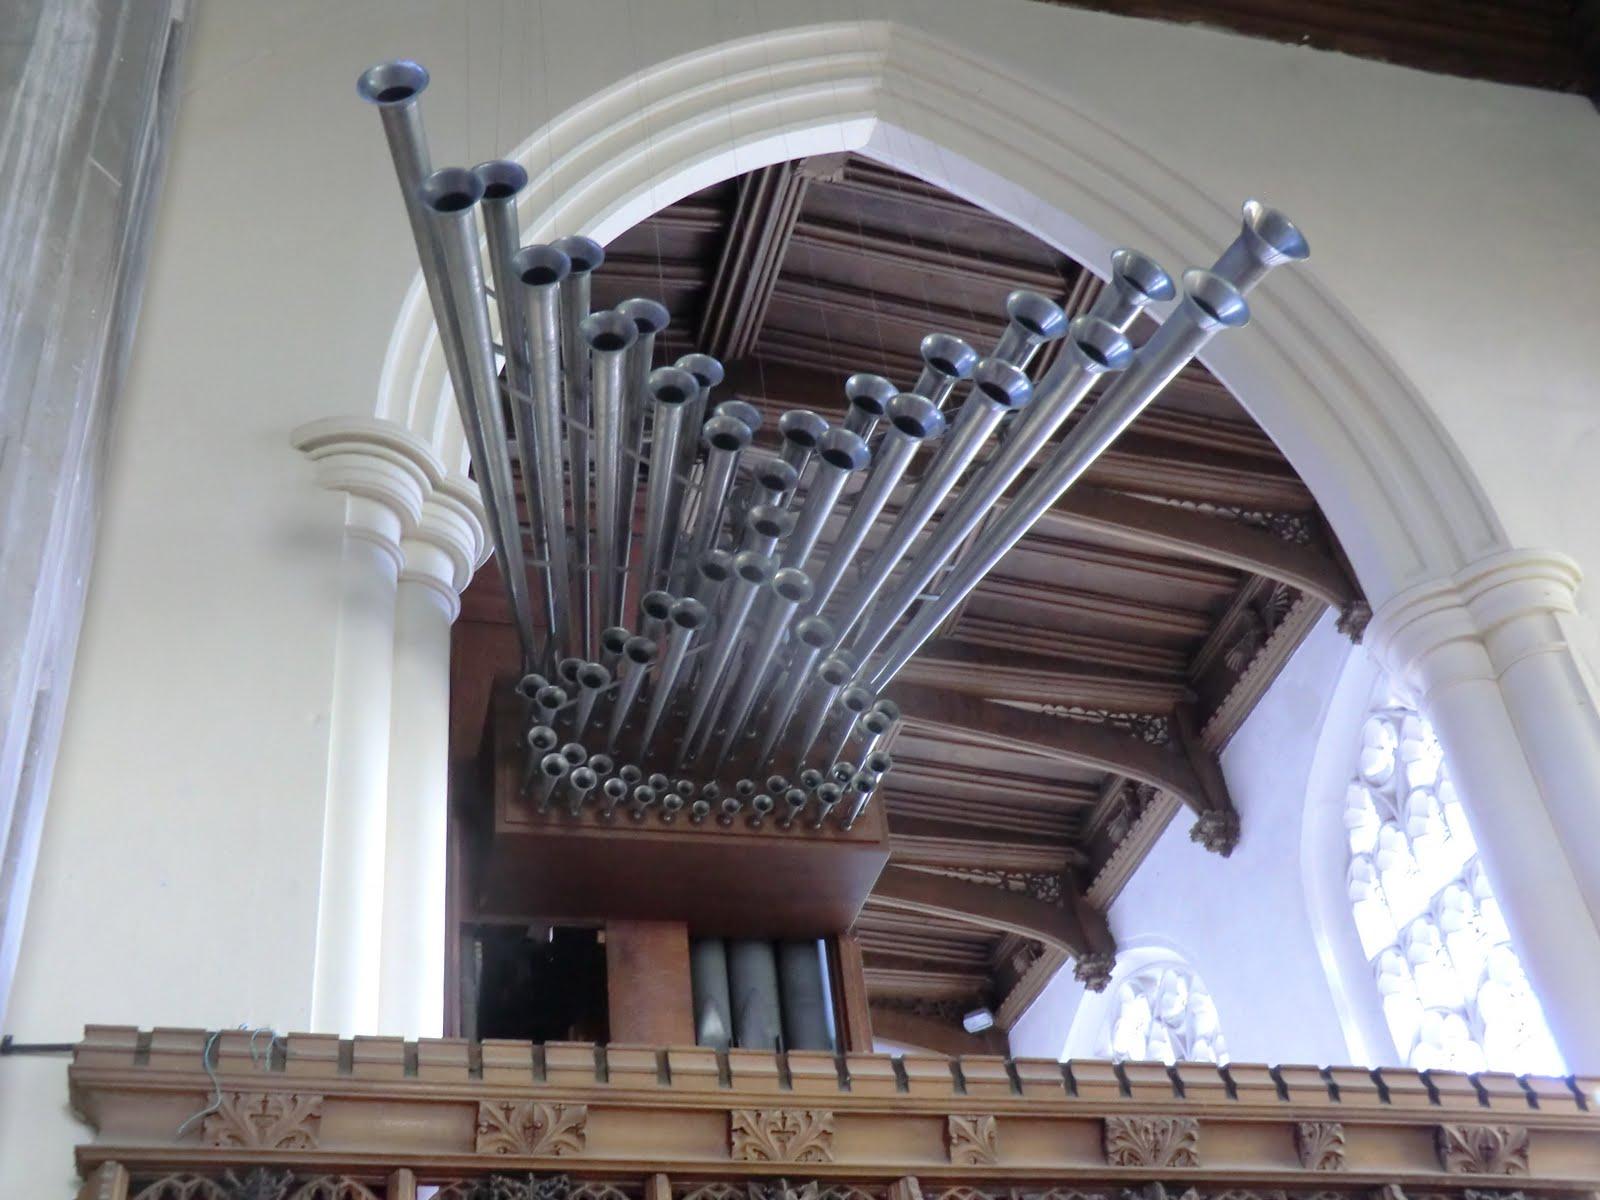 CIMG9784 Trompeta Real organ pipes, Saffron Walden church